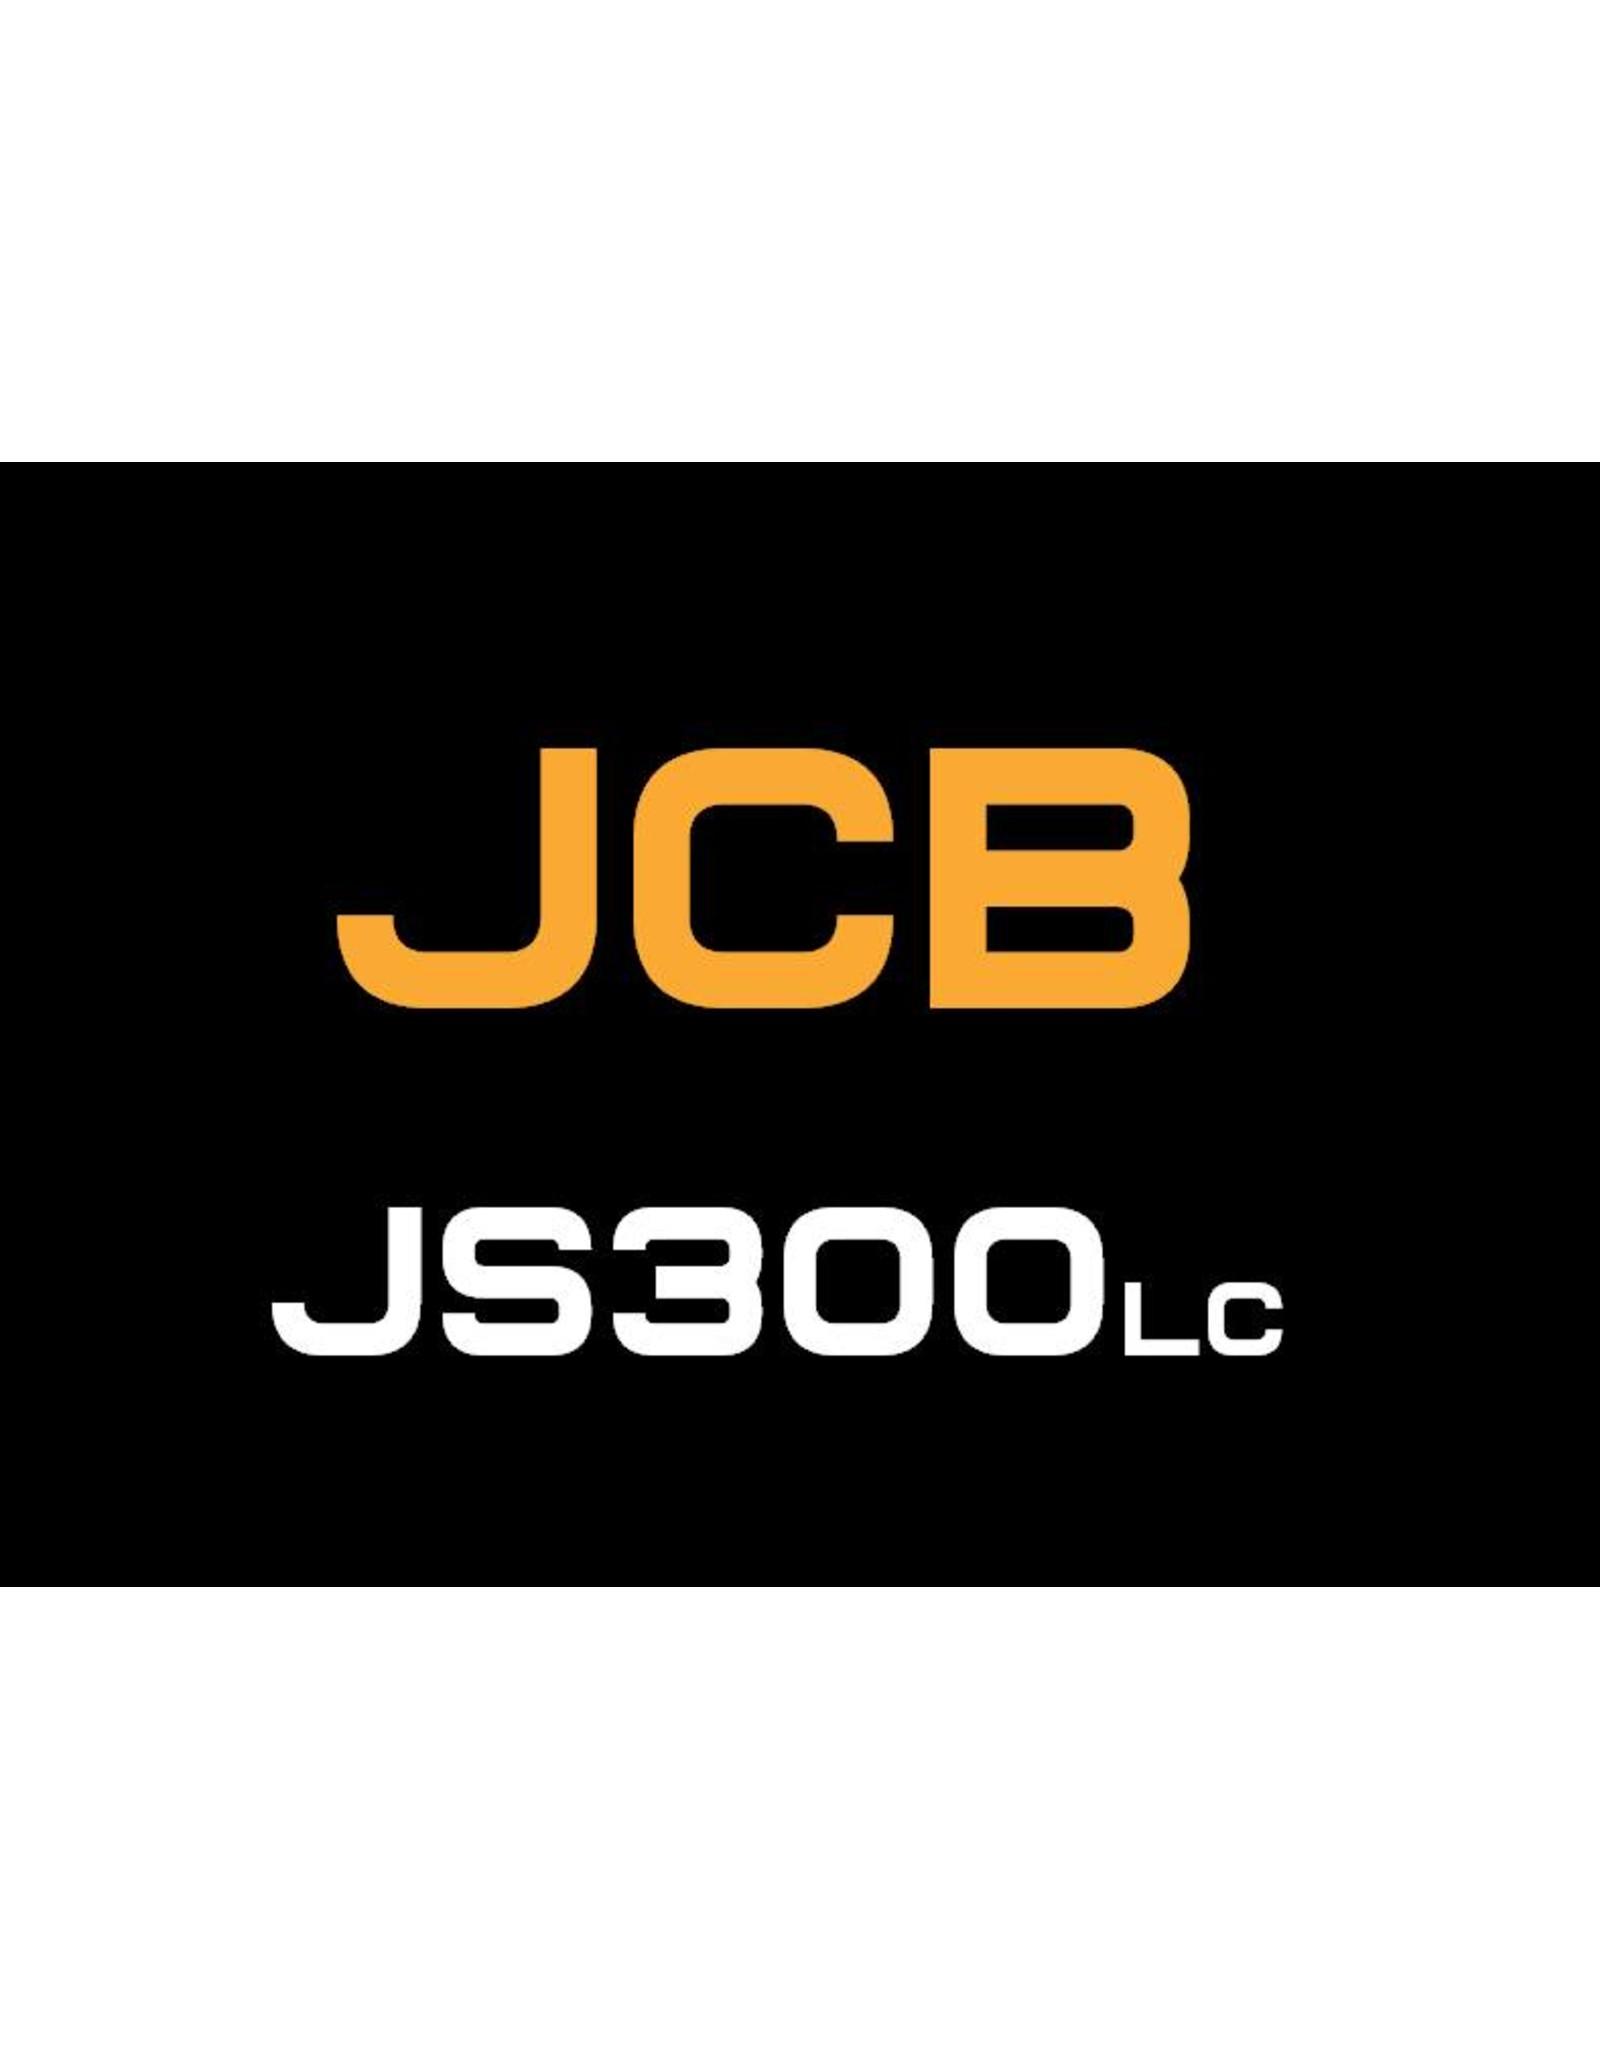 Echle Hartstahl GmbH FOPS for JCB JS300LC